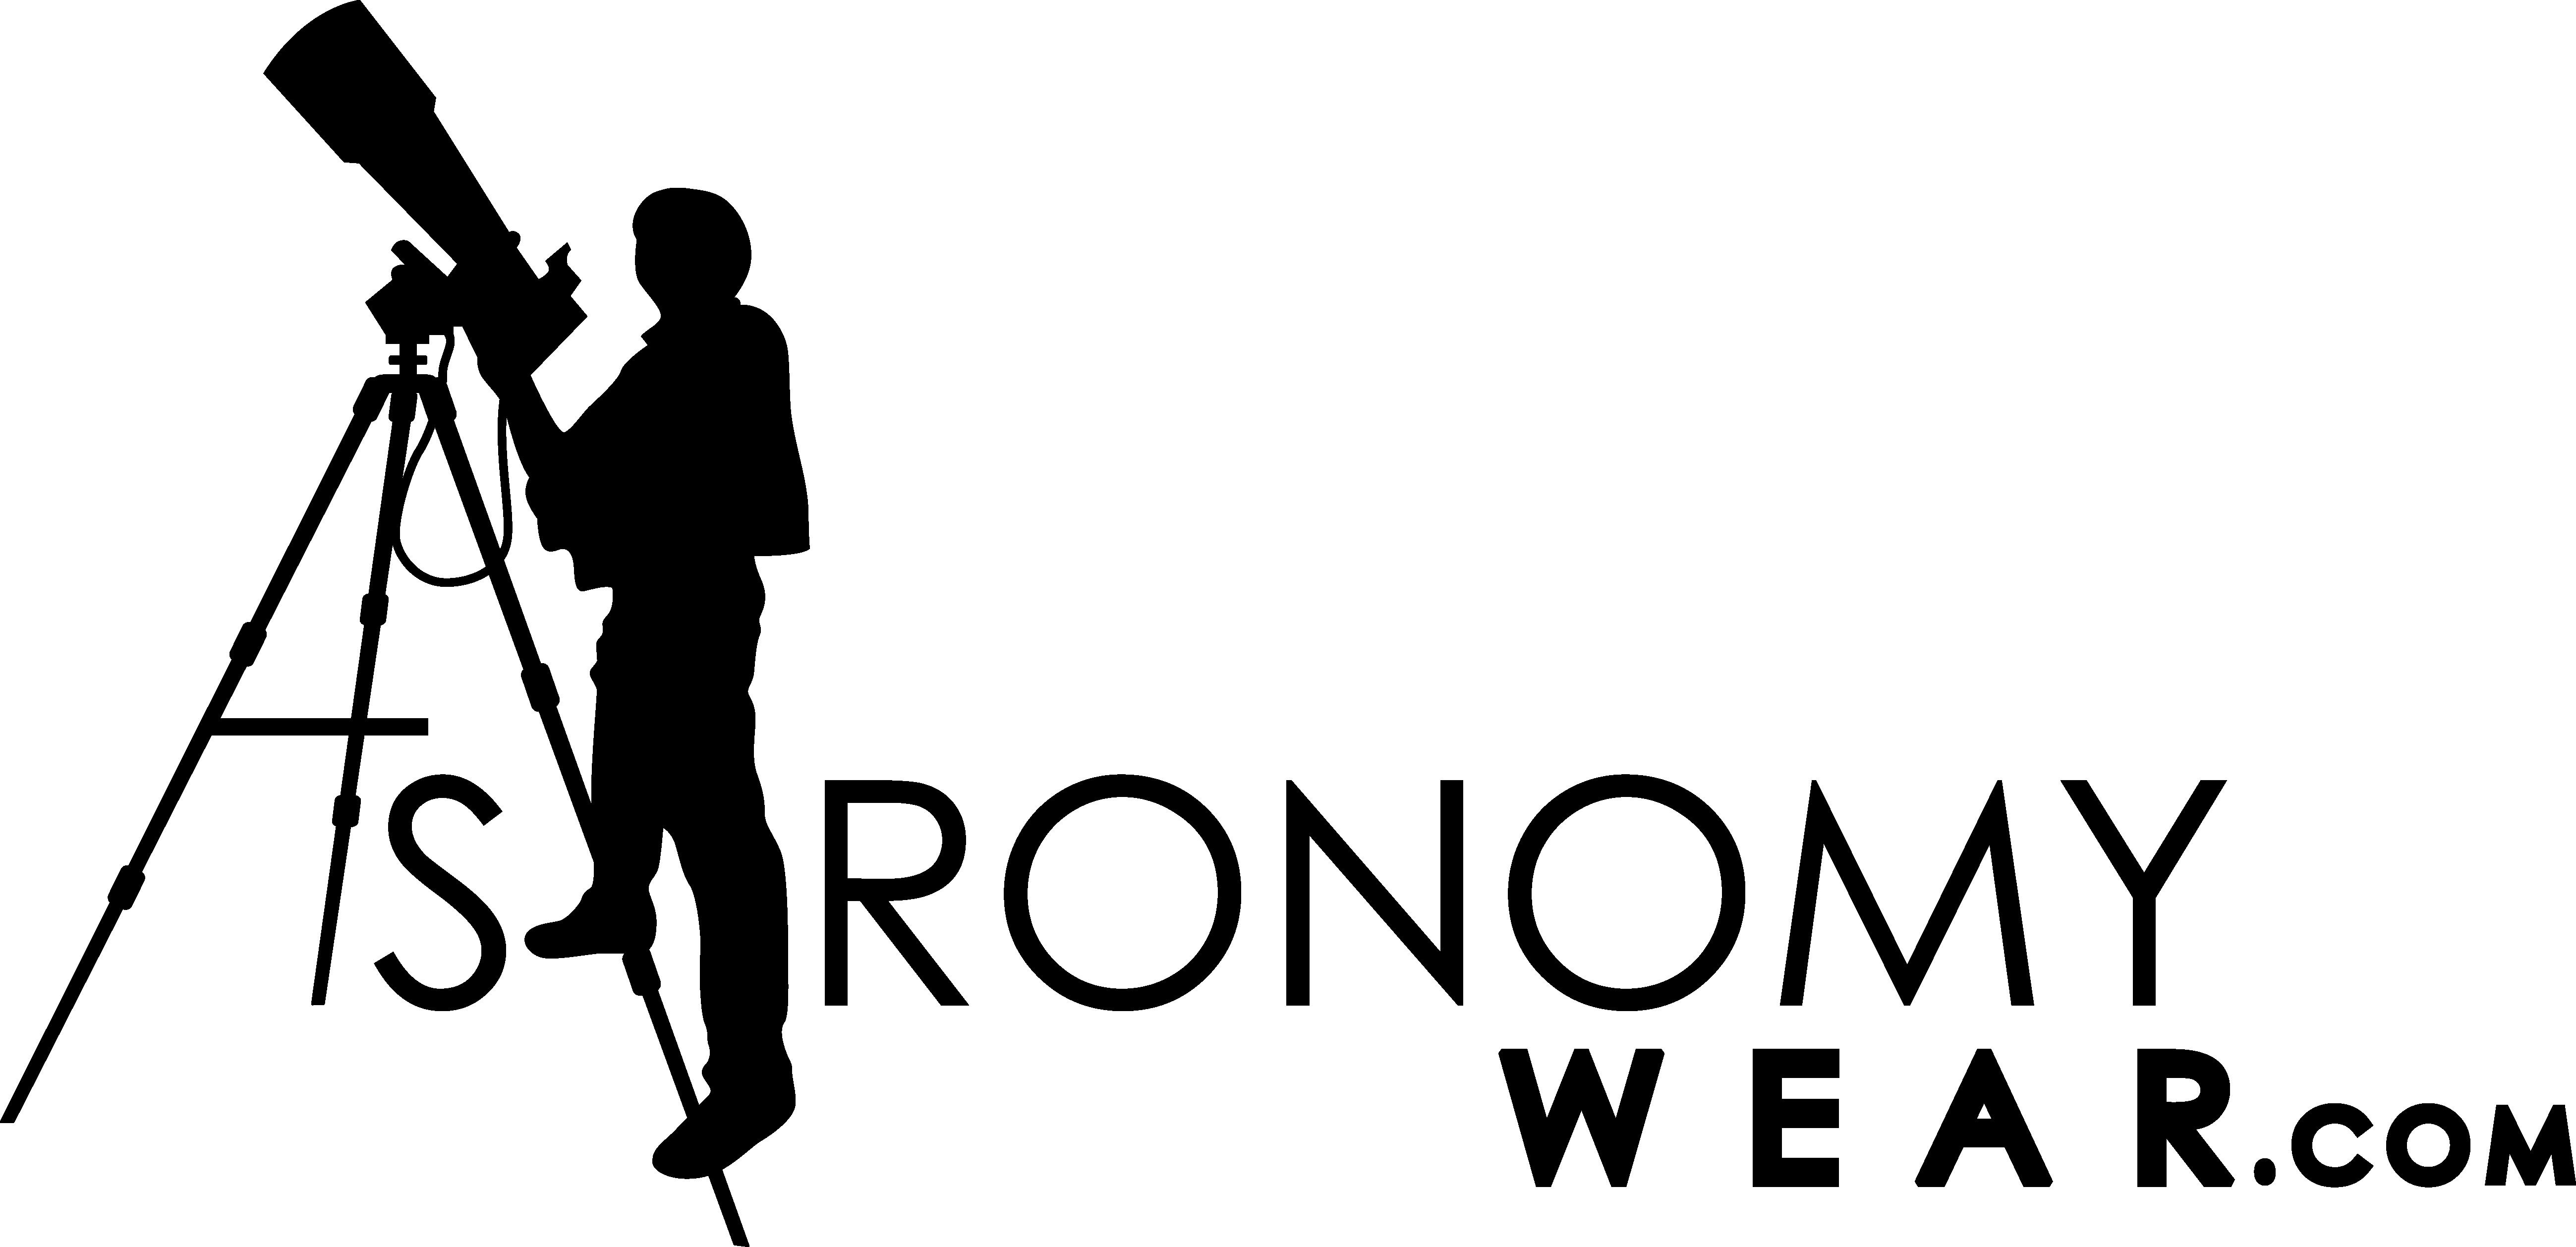 astronomywear logo blk